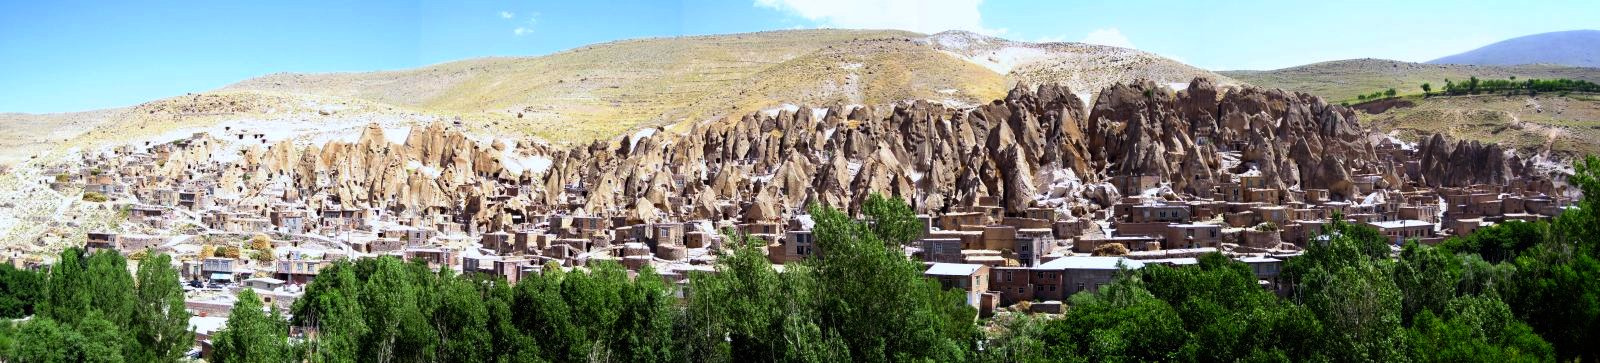 https://upload.wikimedia.org/wikipedia/commons/2/22/Kandovan%2C_Iran_%281259160848%29.jpg